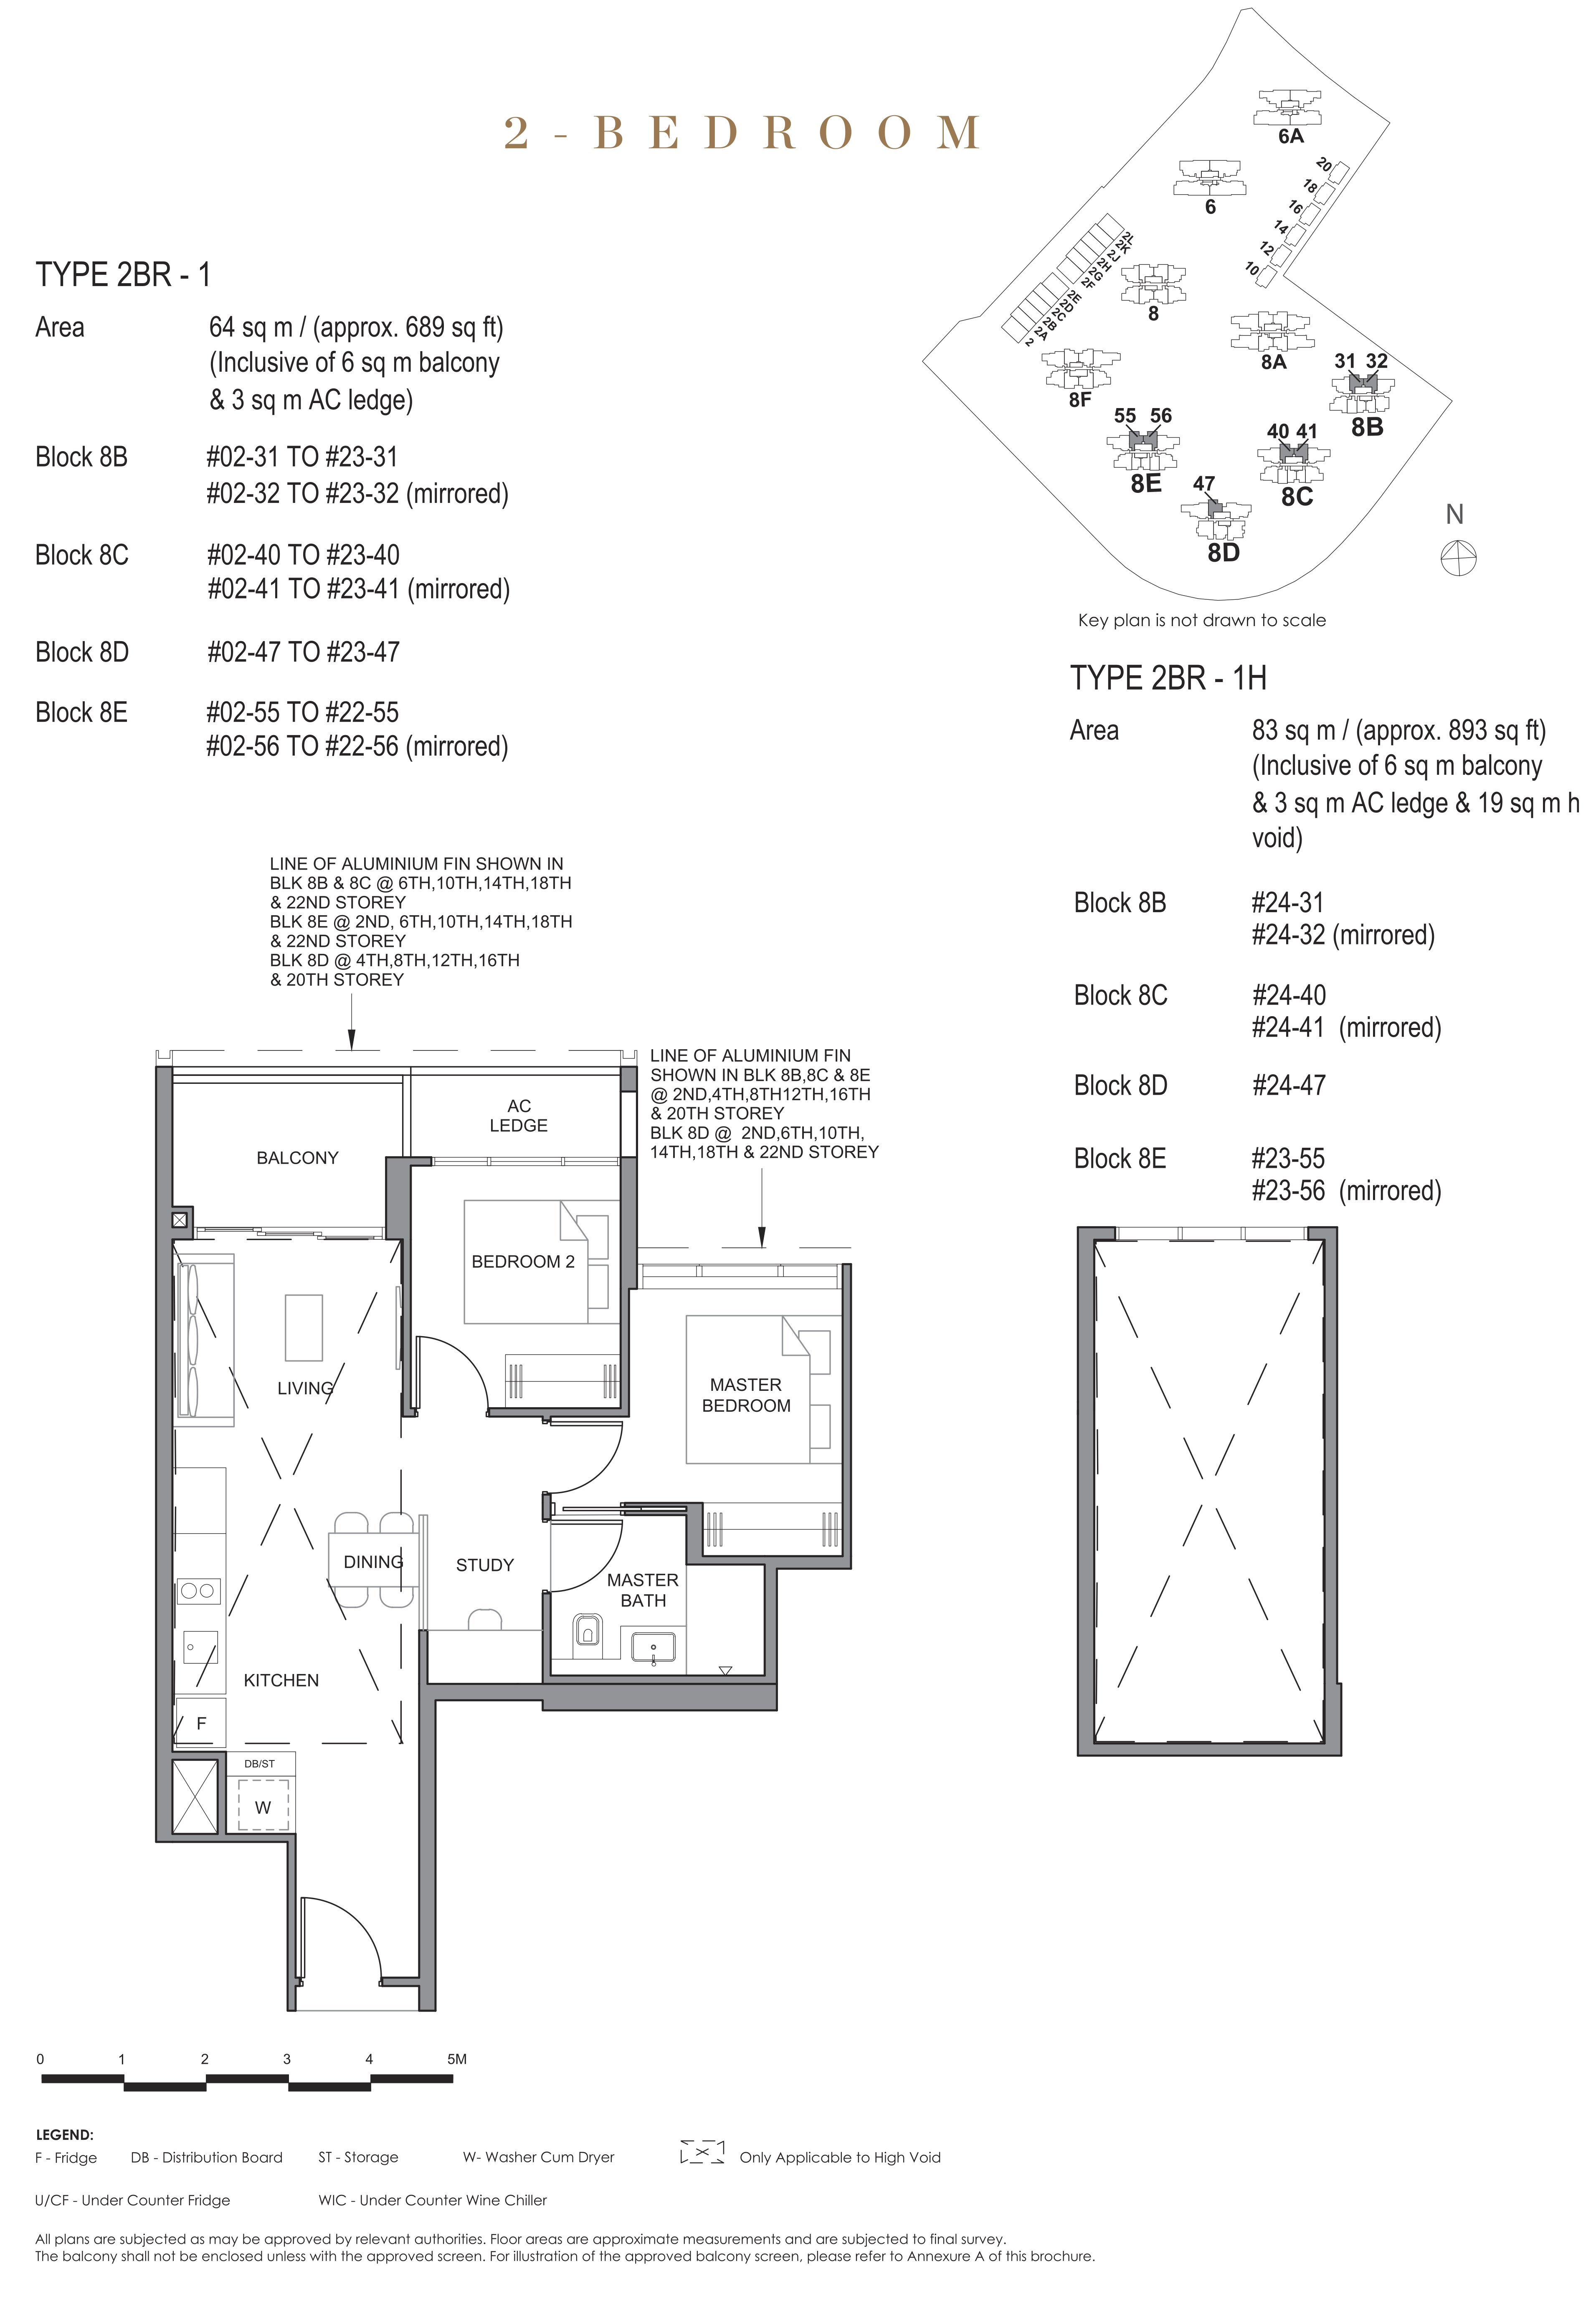 Parc Clematis 锦泰门第 contemporary 2 bedroom 1卧房-书房 2 BR-1